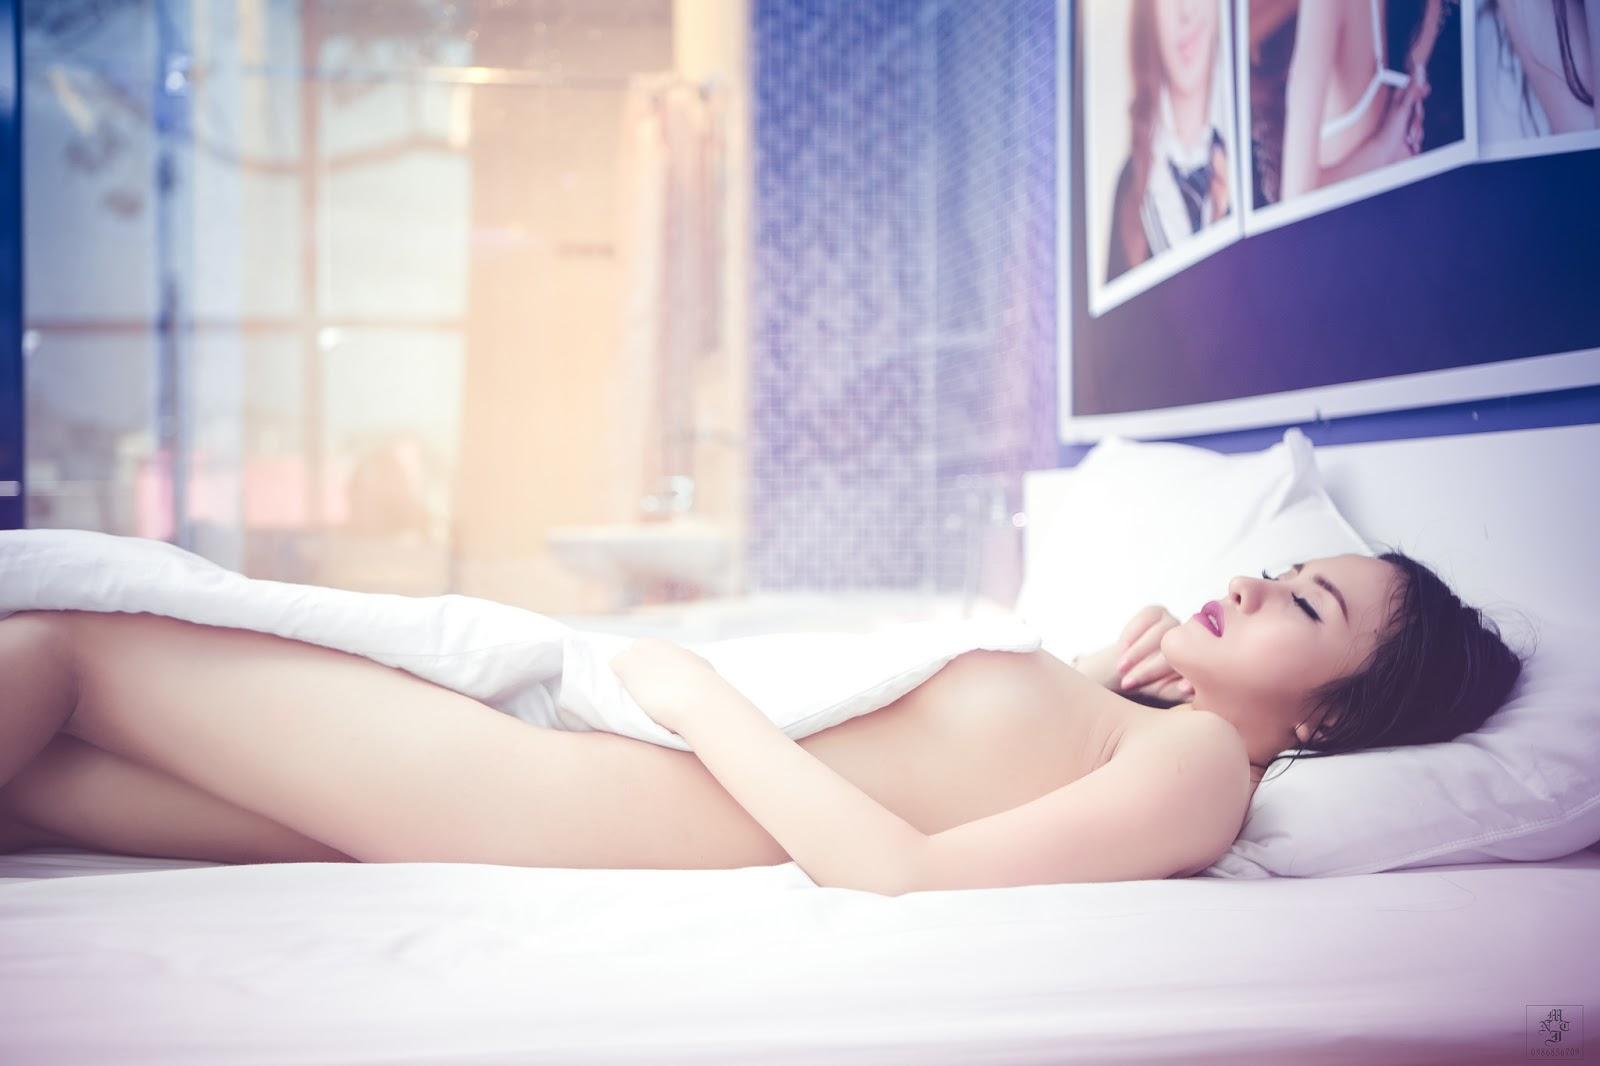 anh-nude-hot-girl-05.jpg